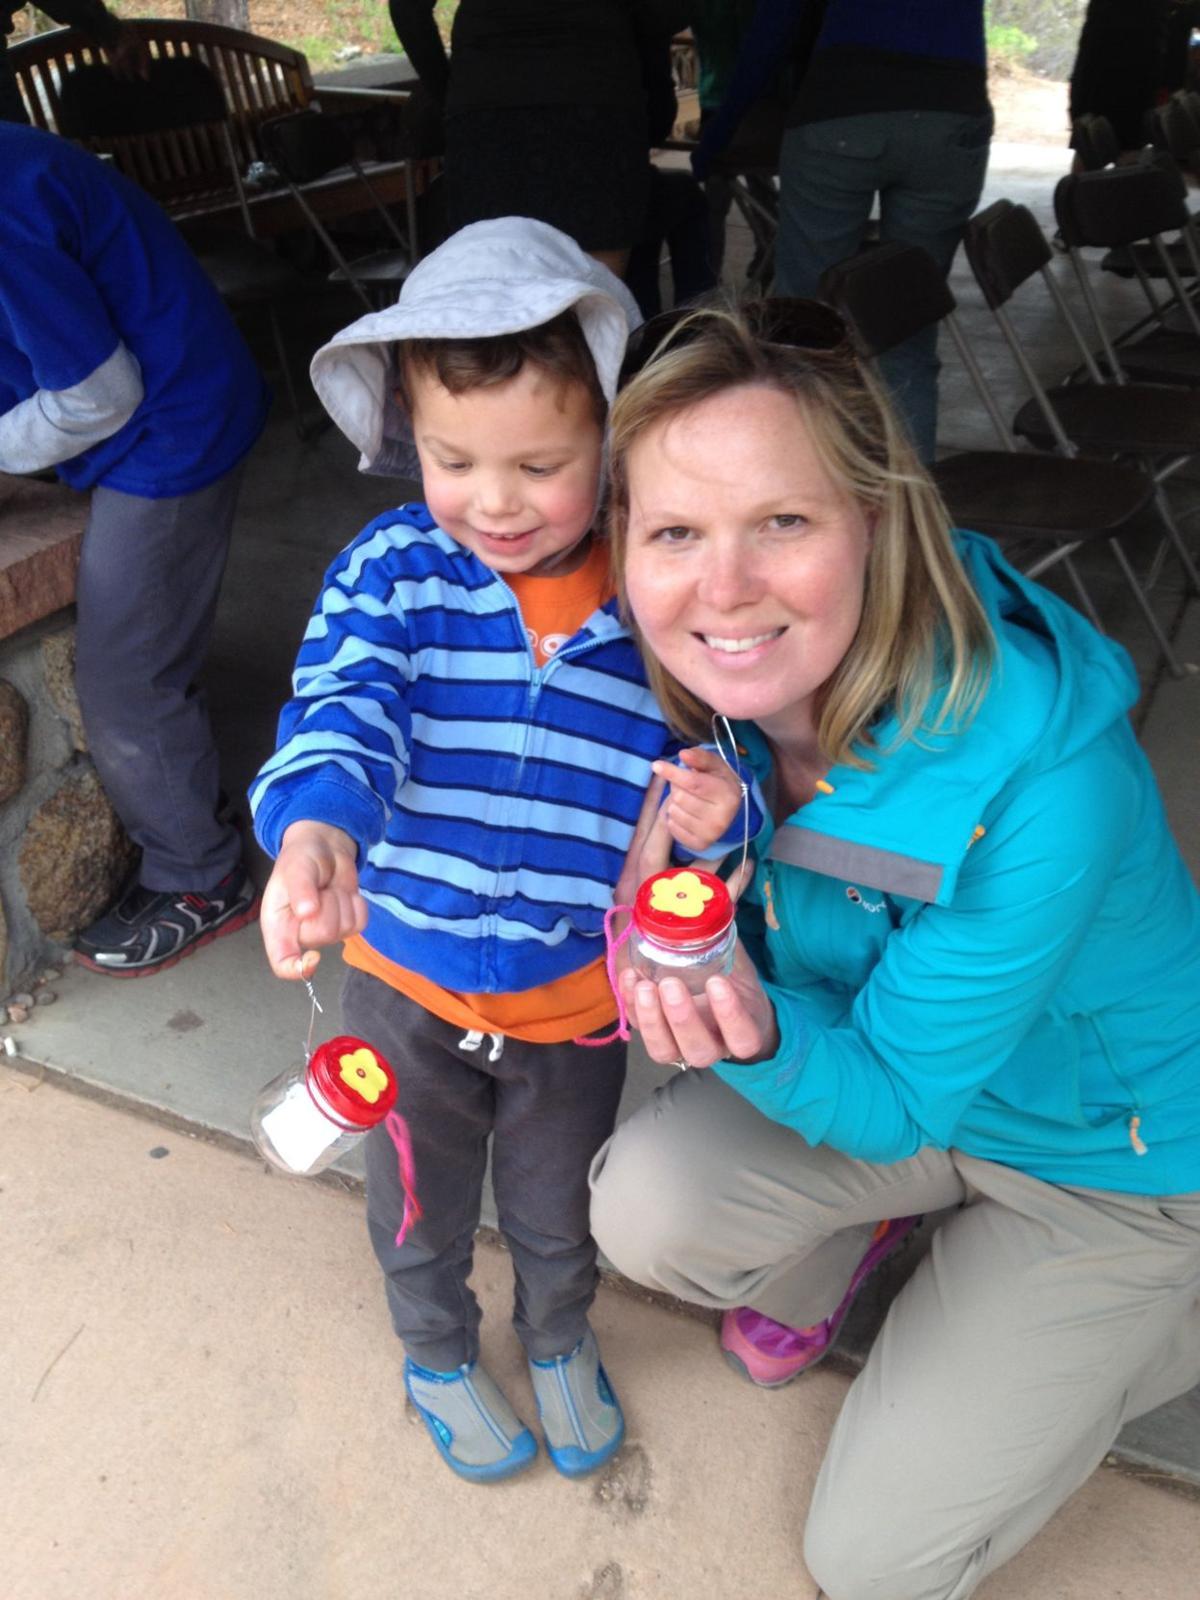 Cheyenne Edition columnist and resident of the Cheyenne Cañon neighborhood Joanna Zaremba and her son, Steven